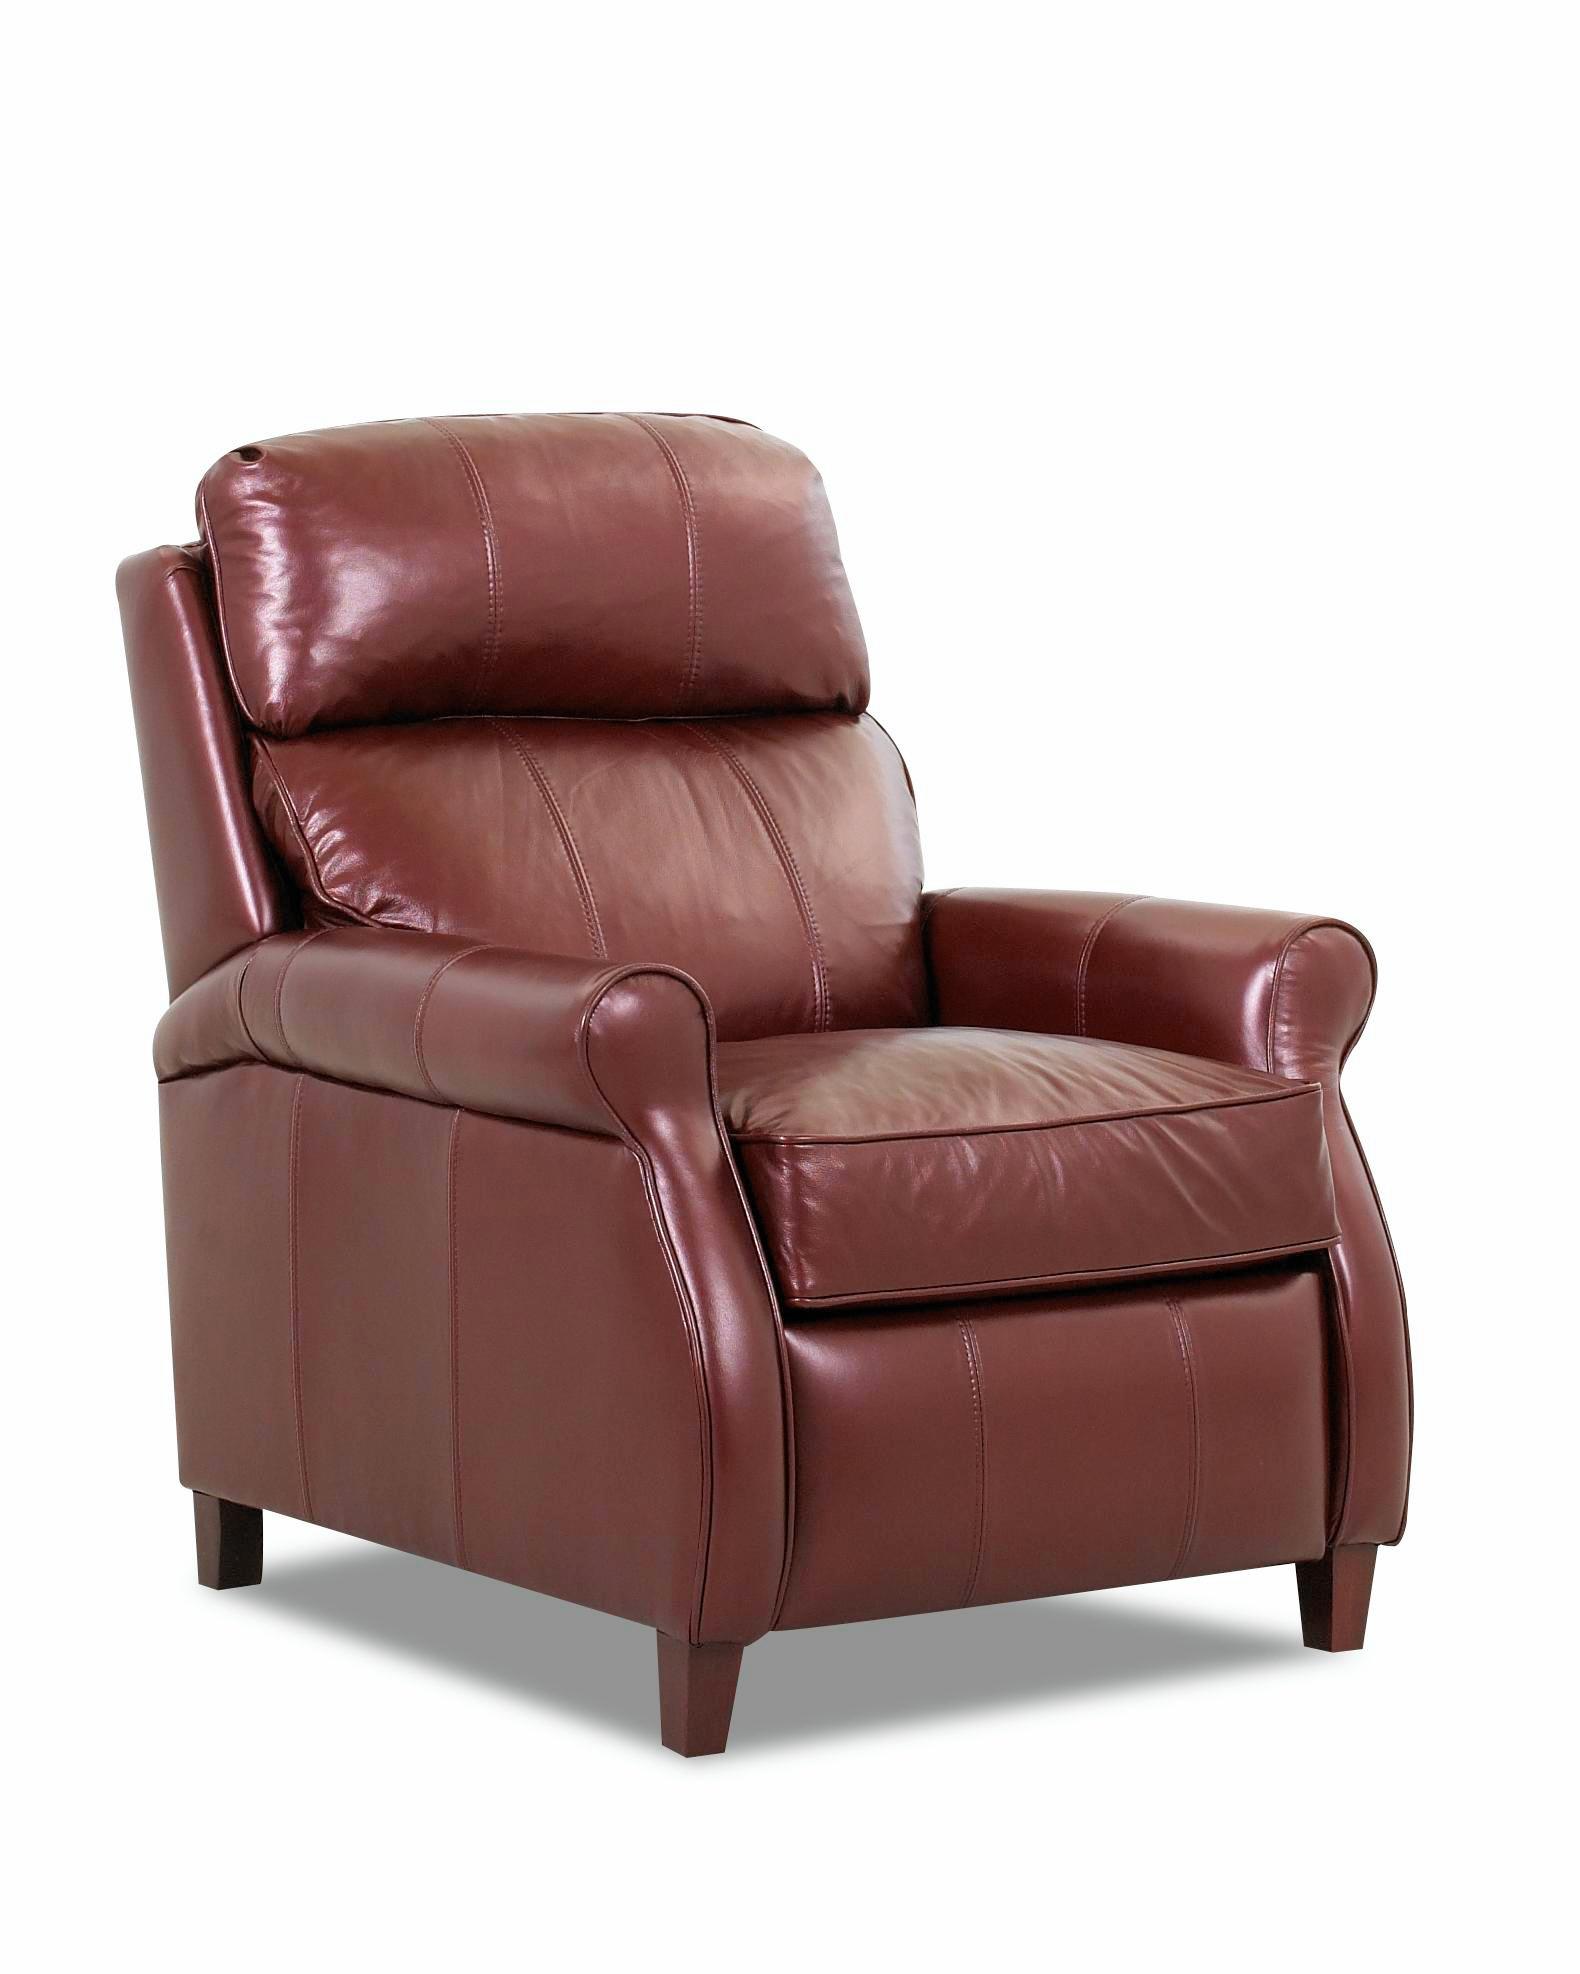 Comfort Design Leslie II Chair CL727 HLRC